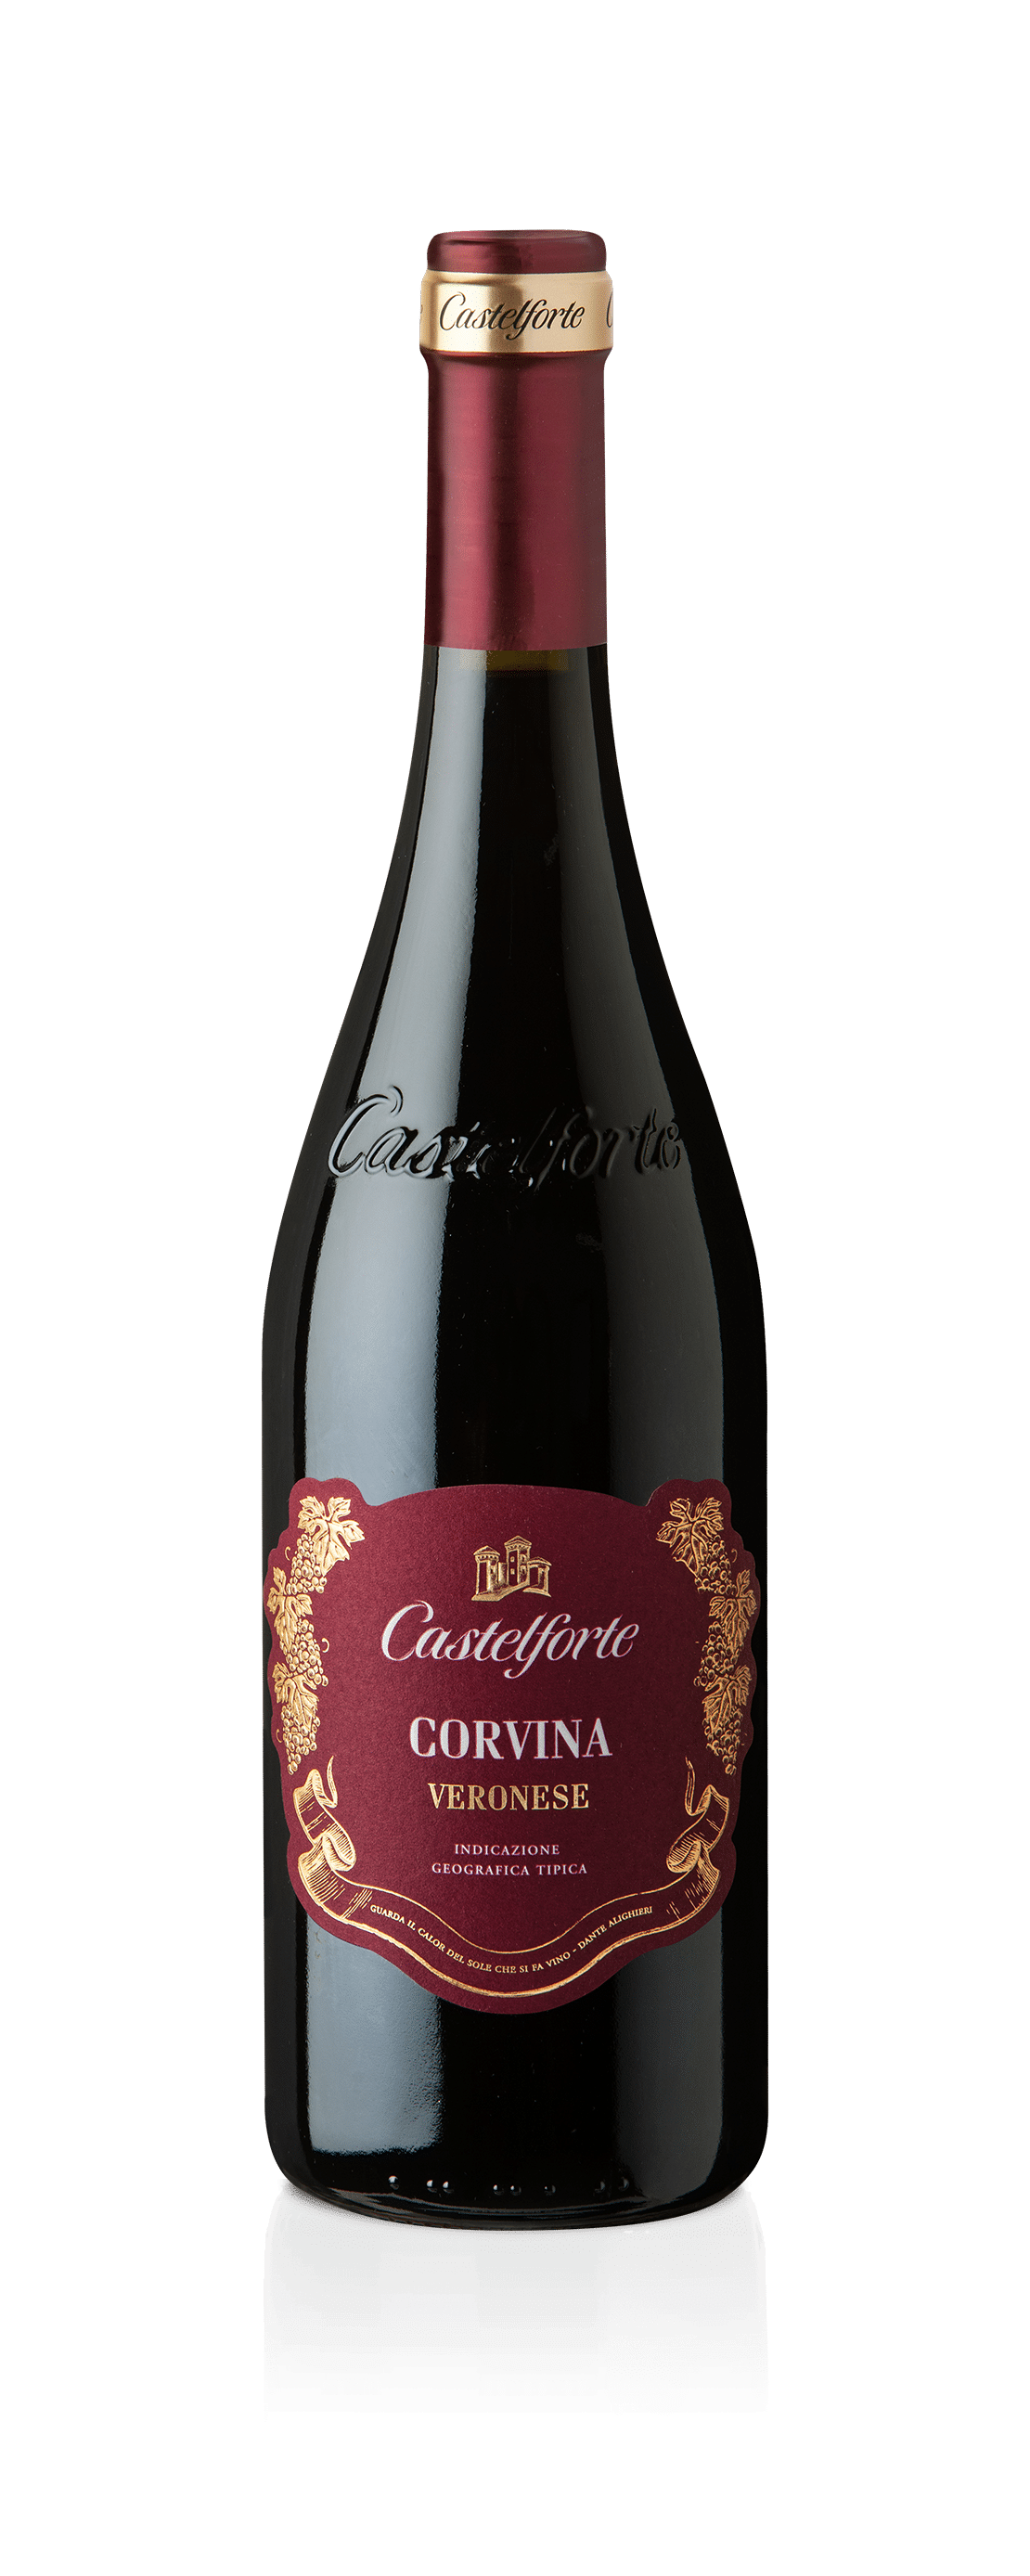 Castelforte Corvina